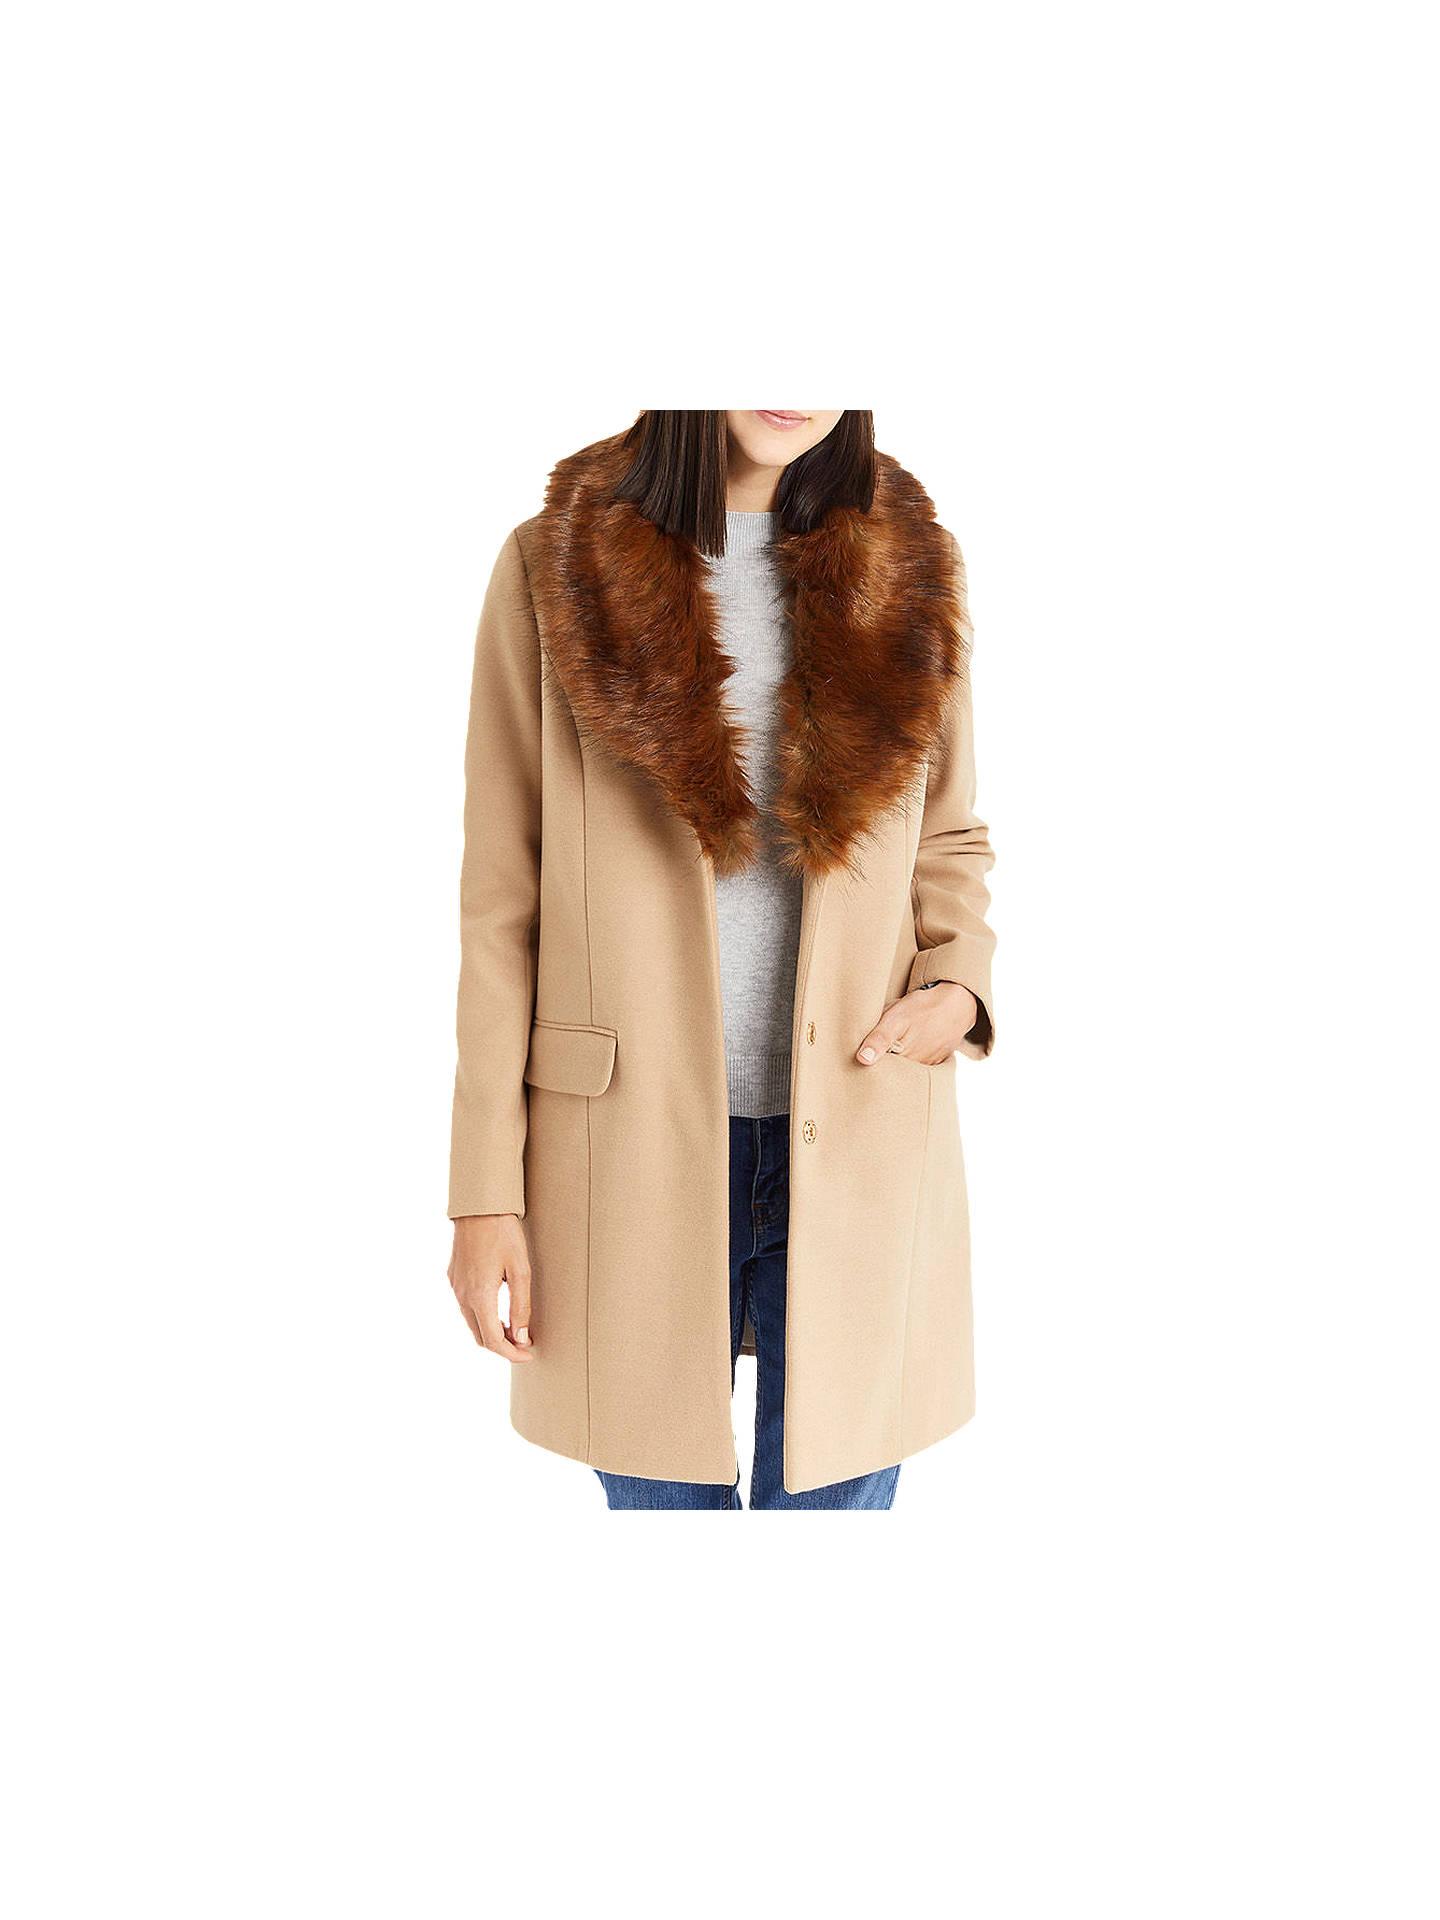 f9f6c11de9ba Buy Oasis Fran Shawl Fur Collar Coat, Tan, XS Online at johnlewis.com ...